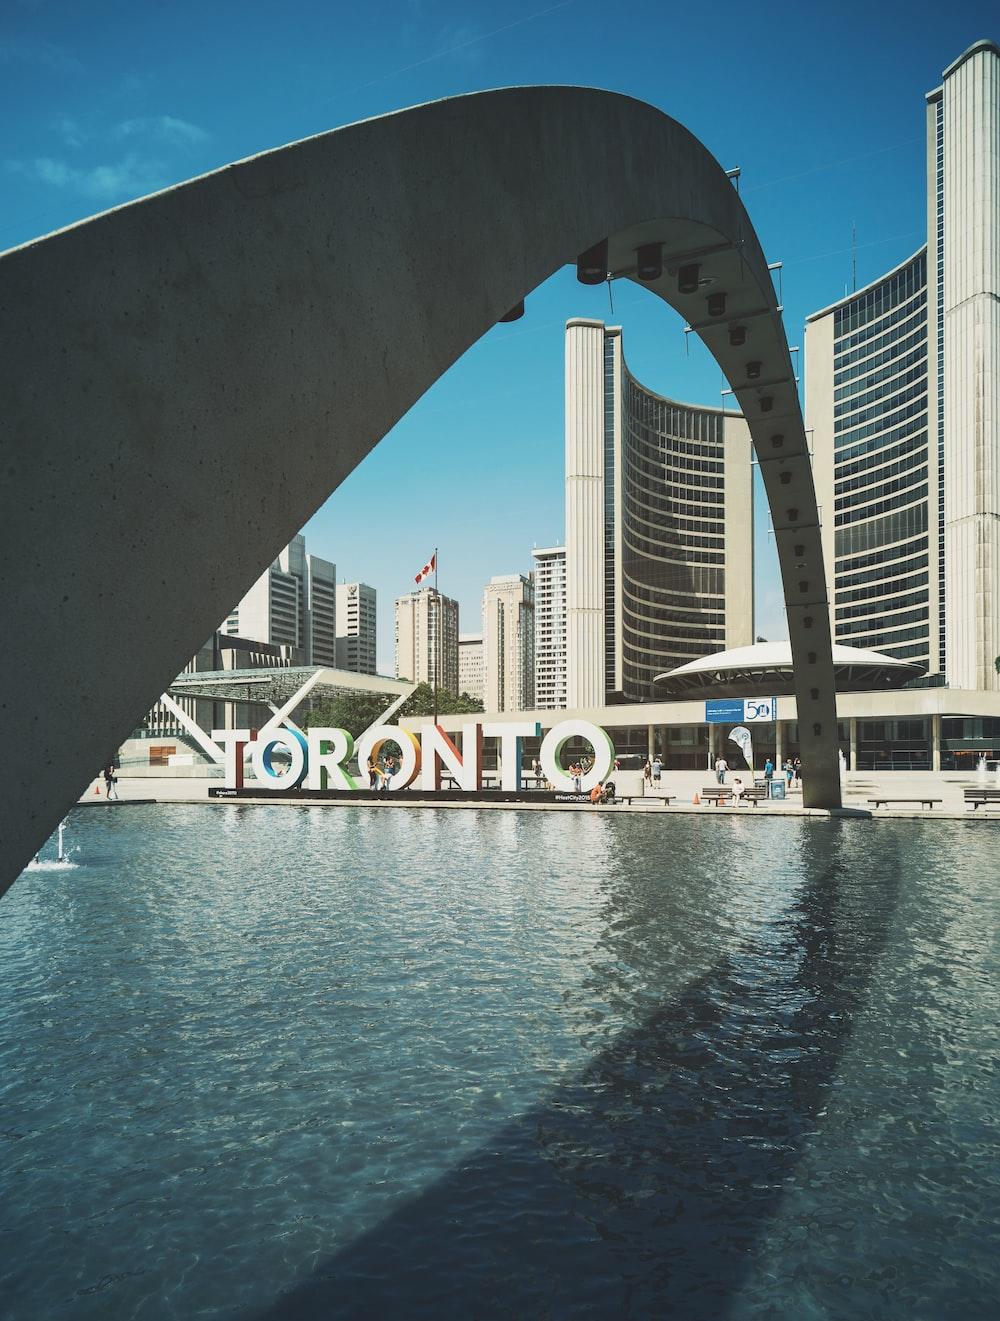 Toronto signage